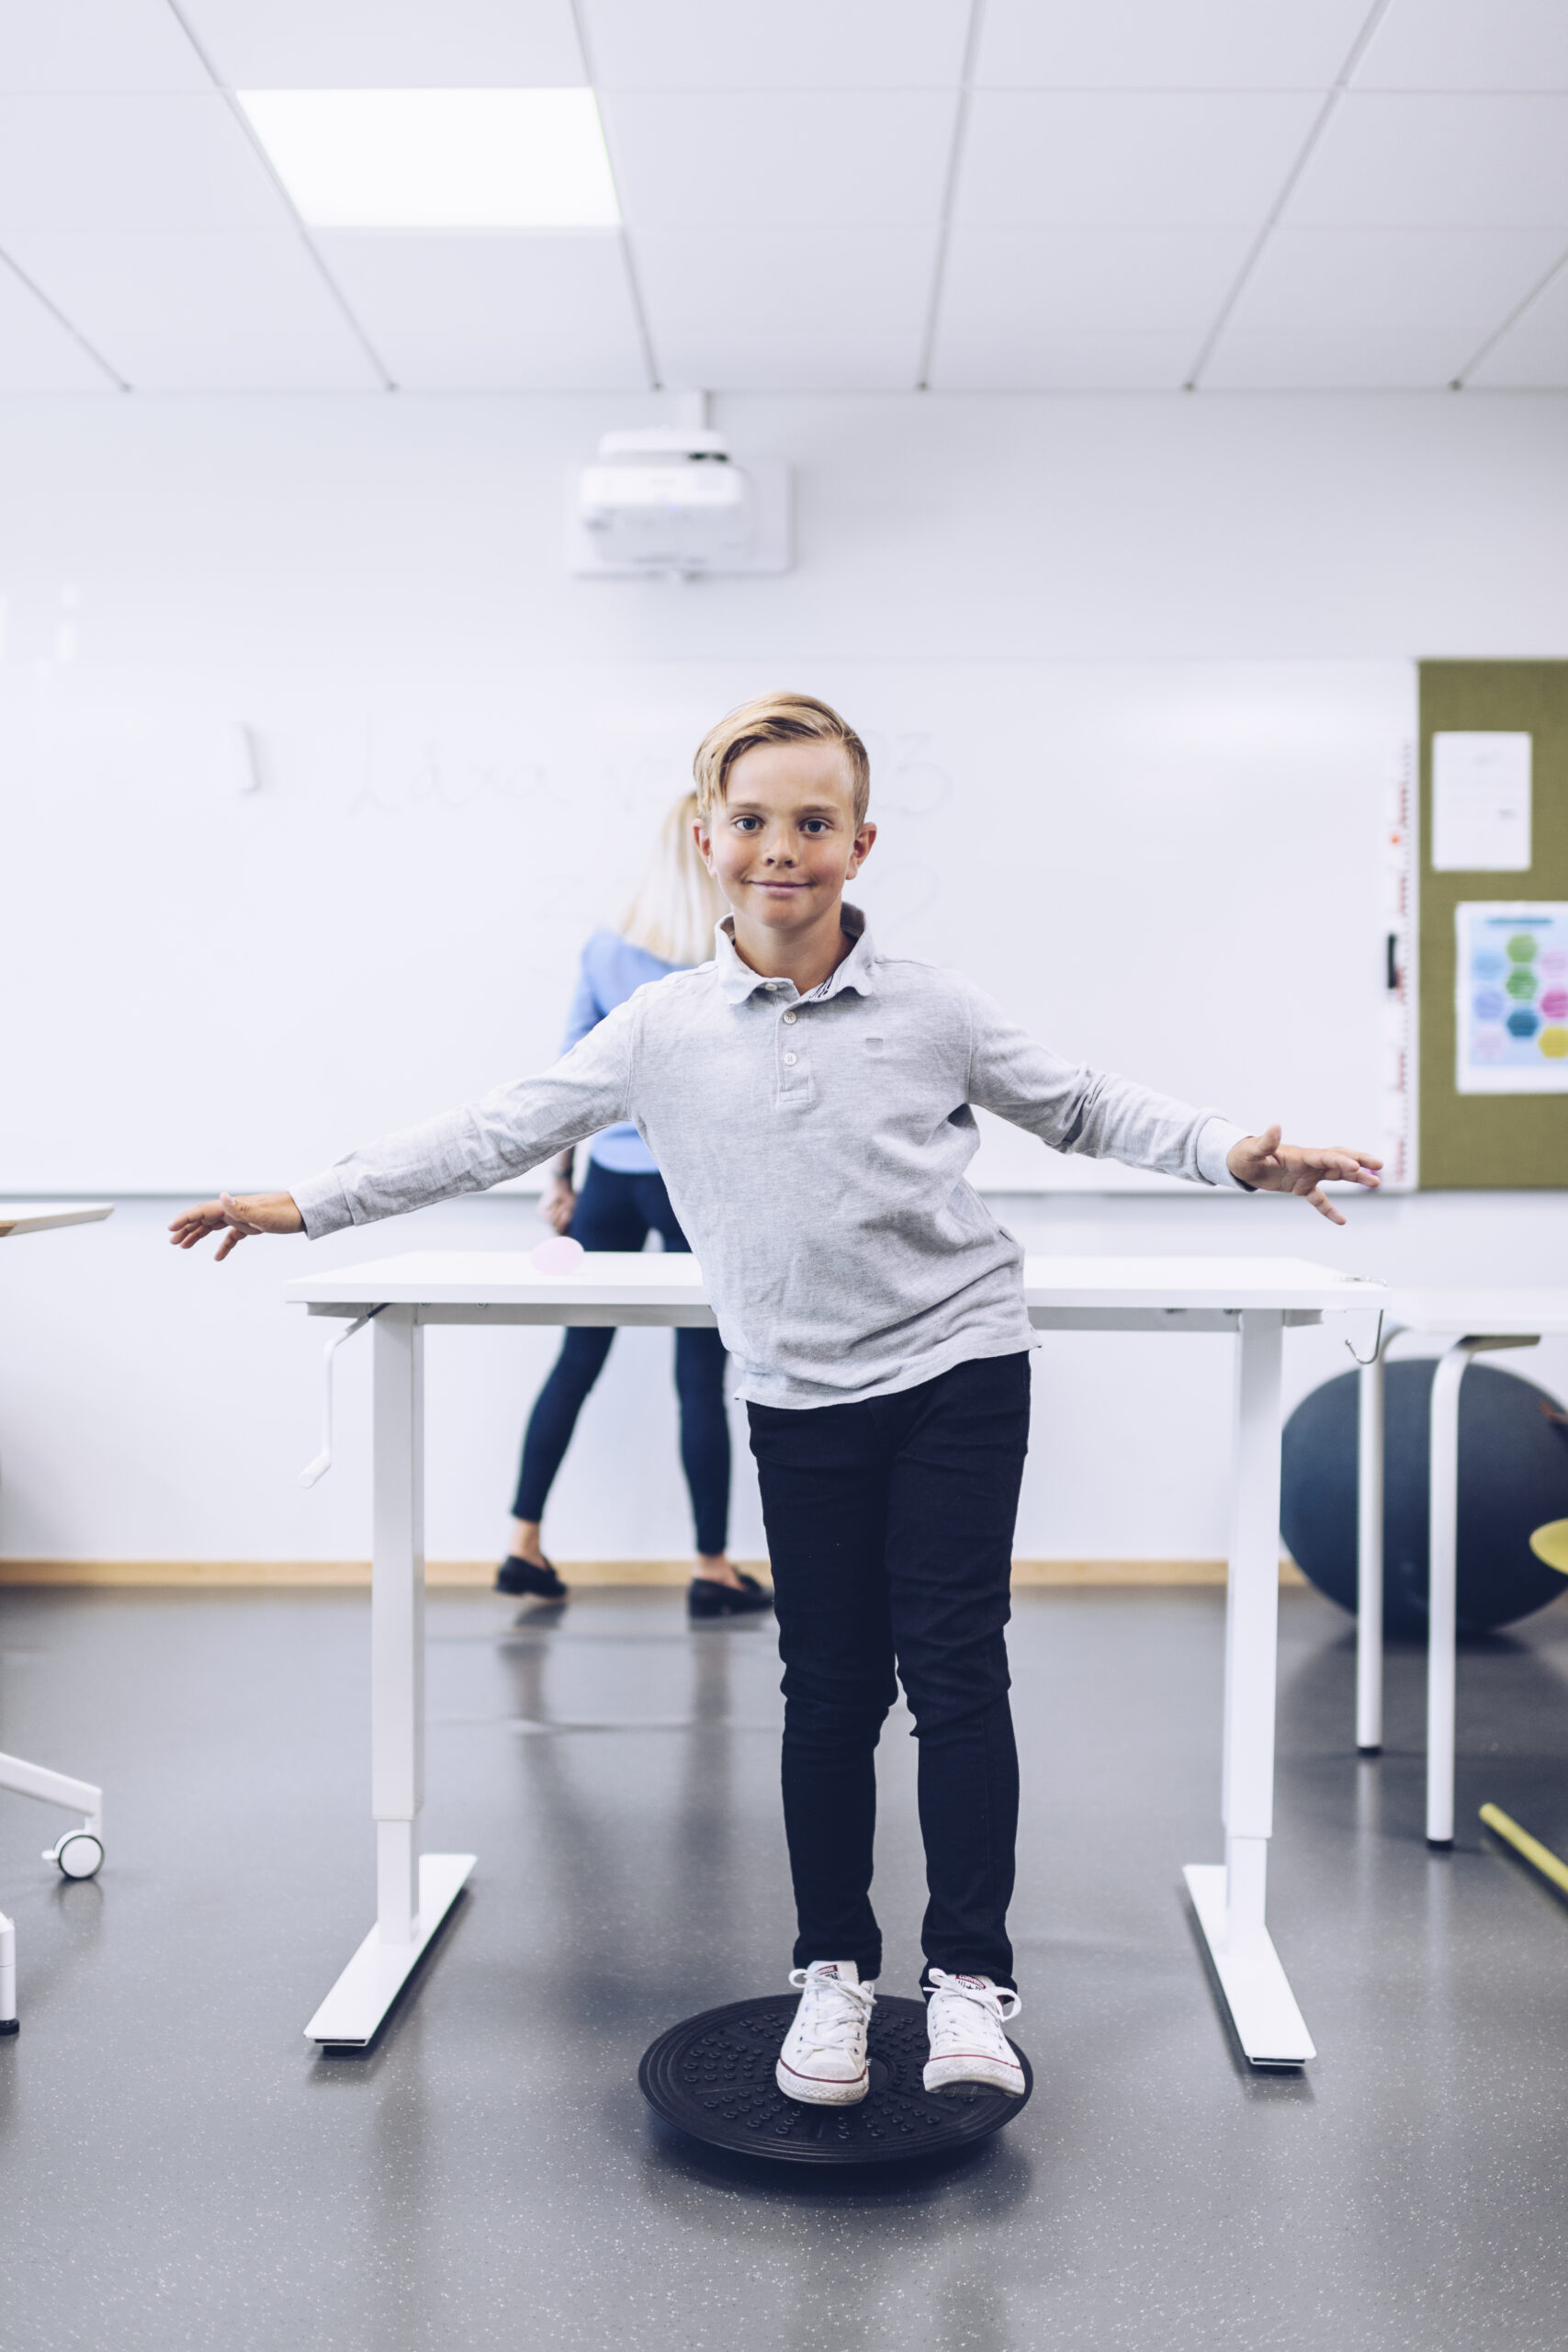 2018-05-29 Växjö Jobout produkter i skolmiljö. Foto: Jonas Ljungdahl